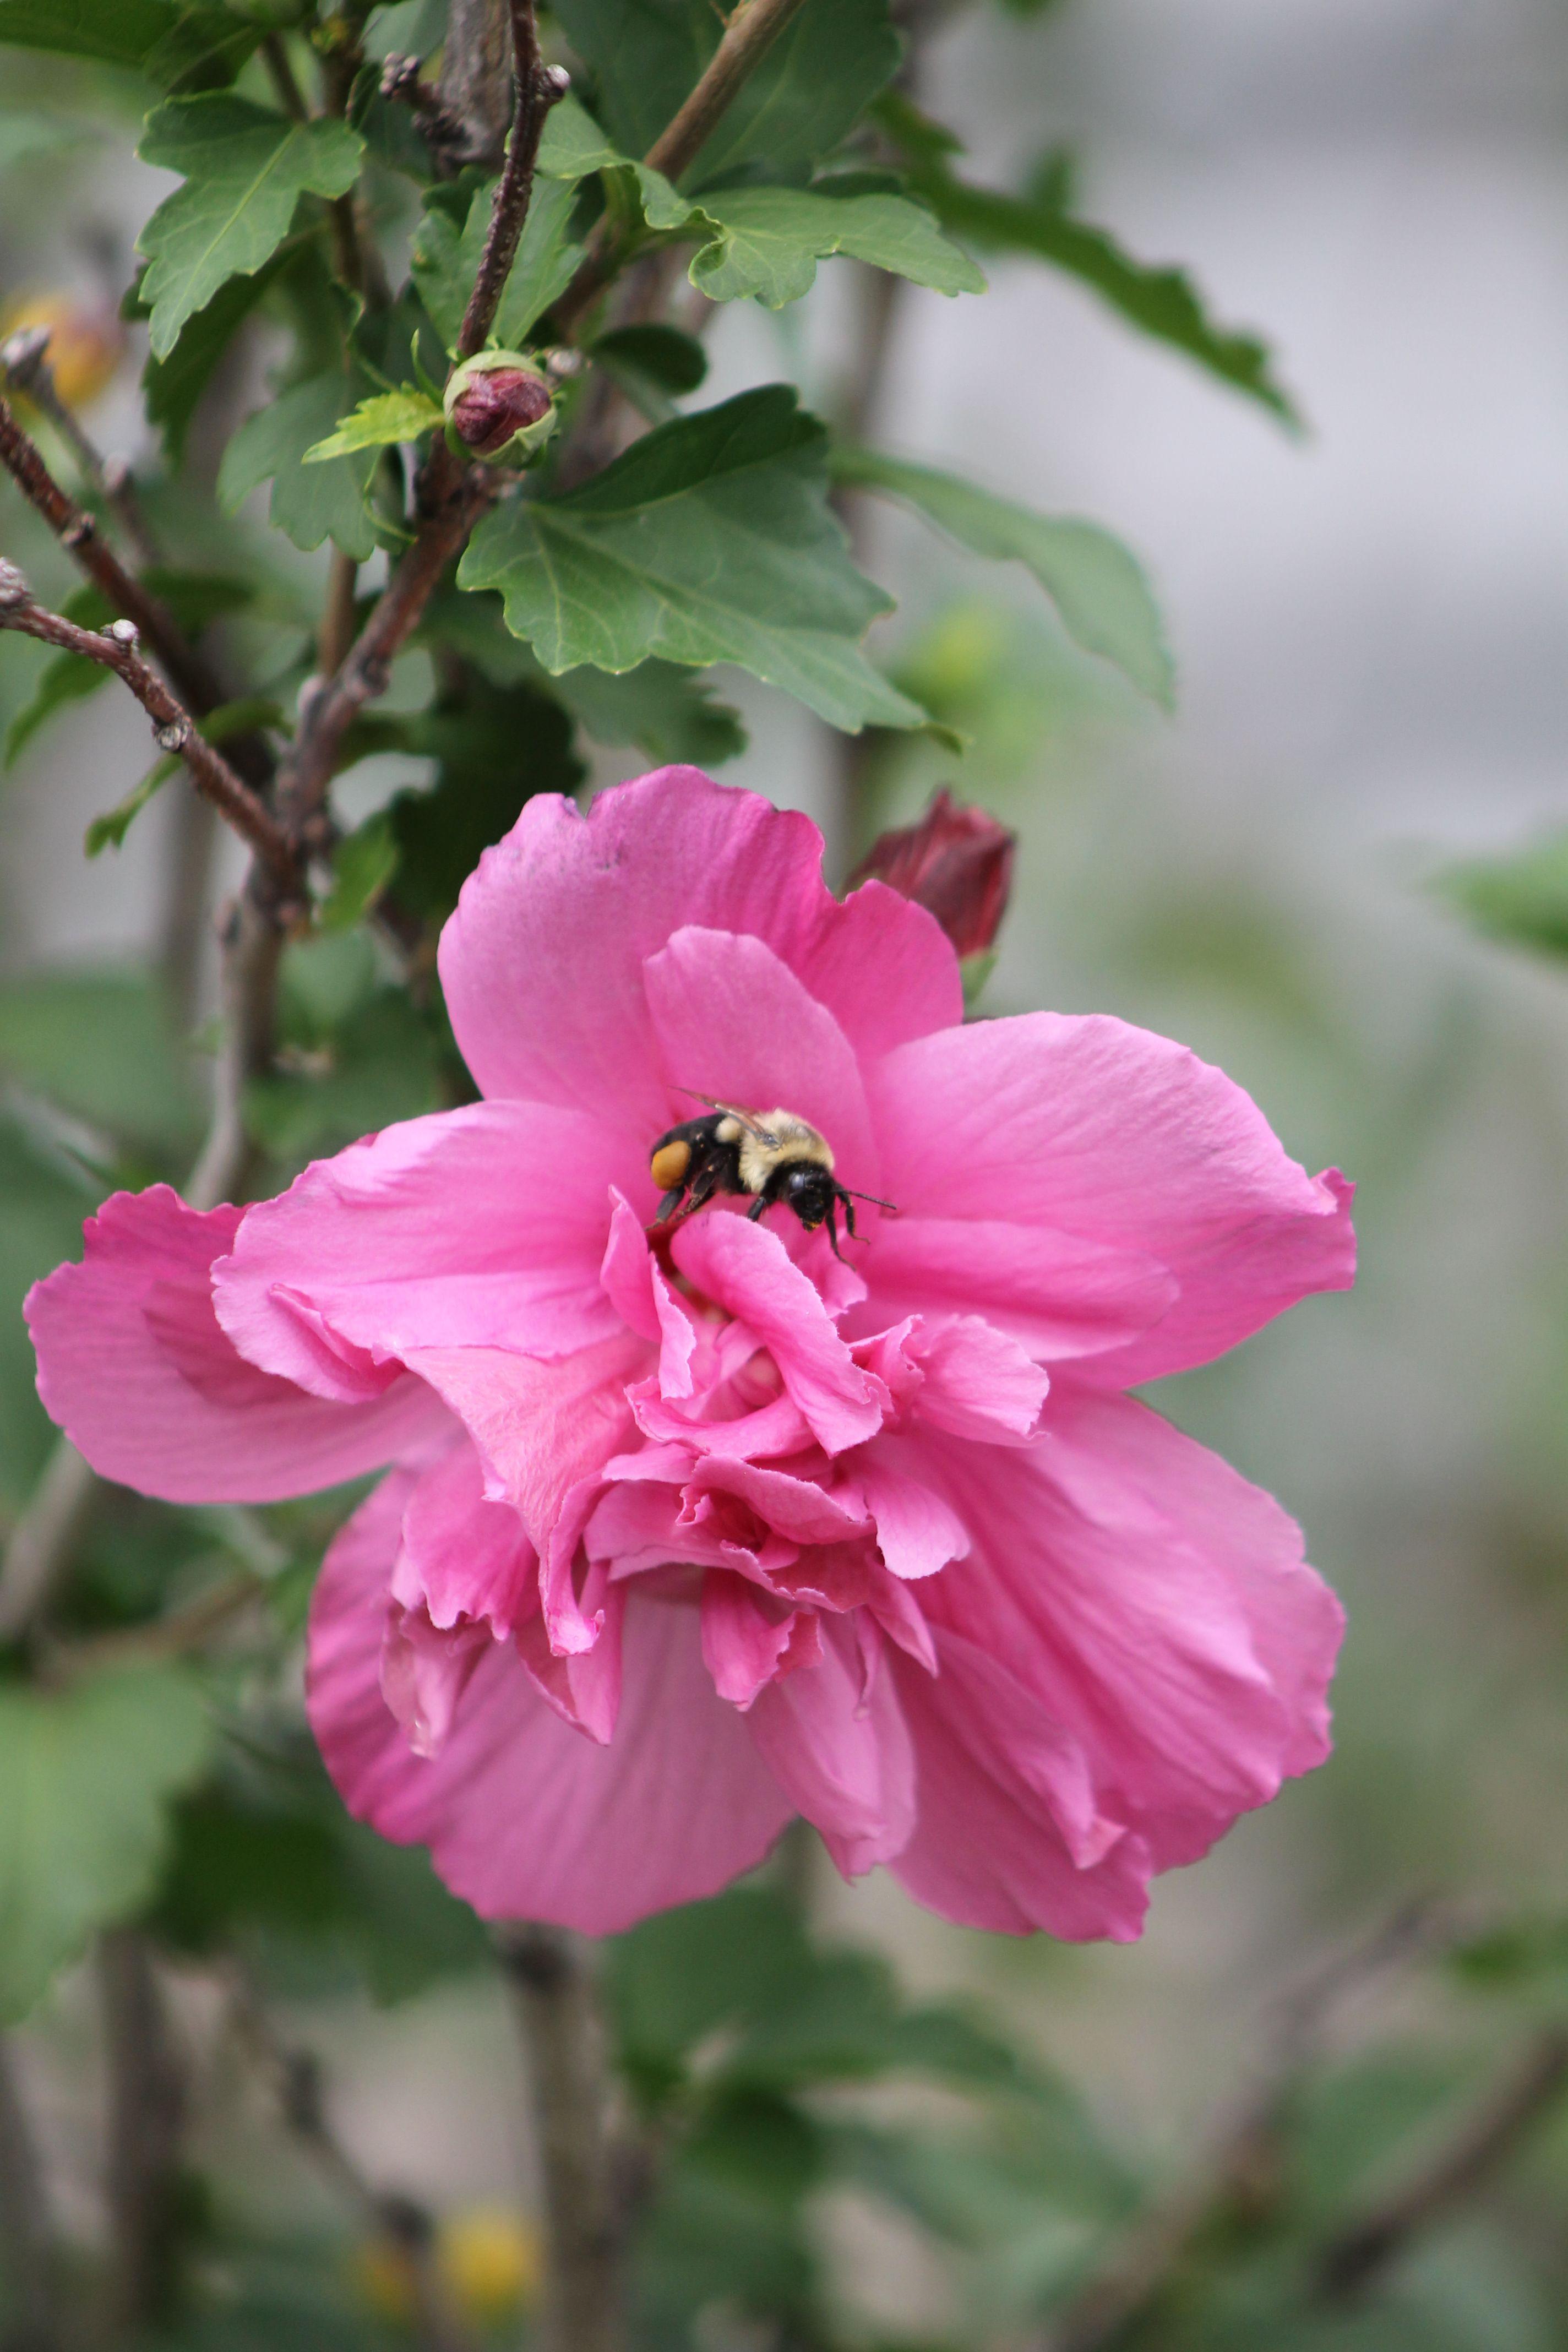 Rose of Sharon bloom